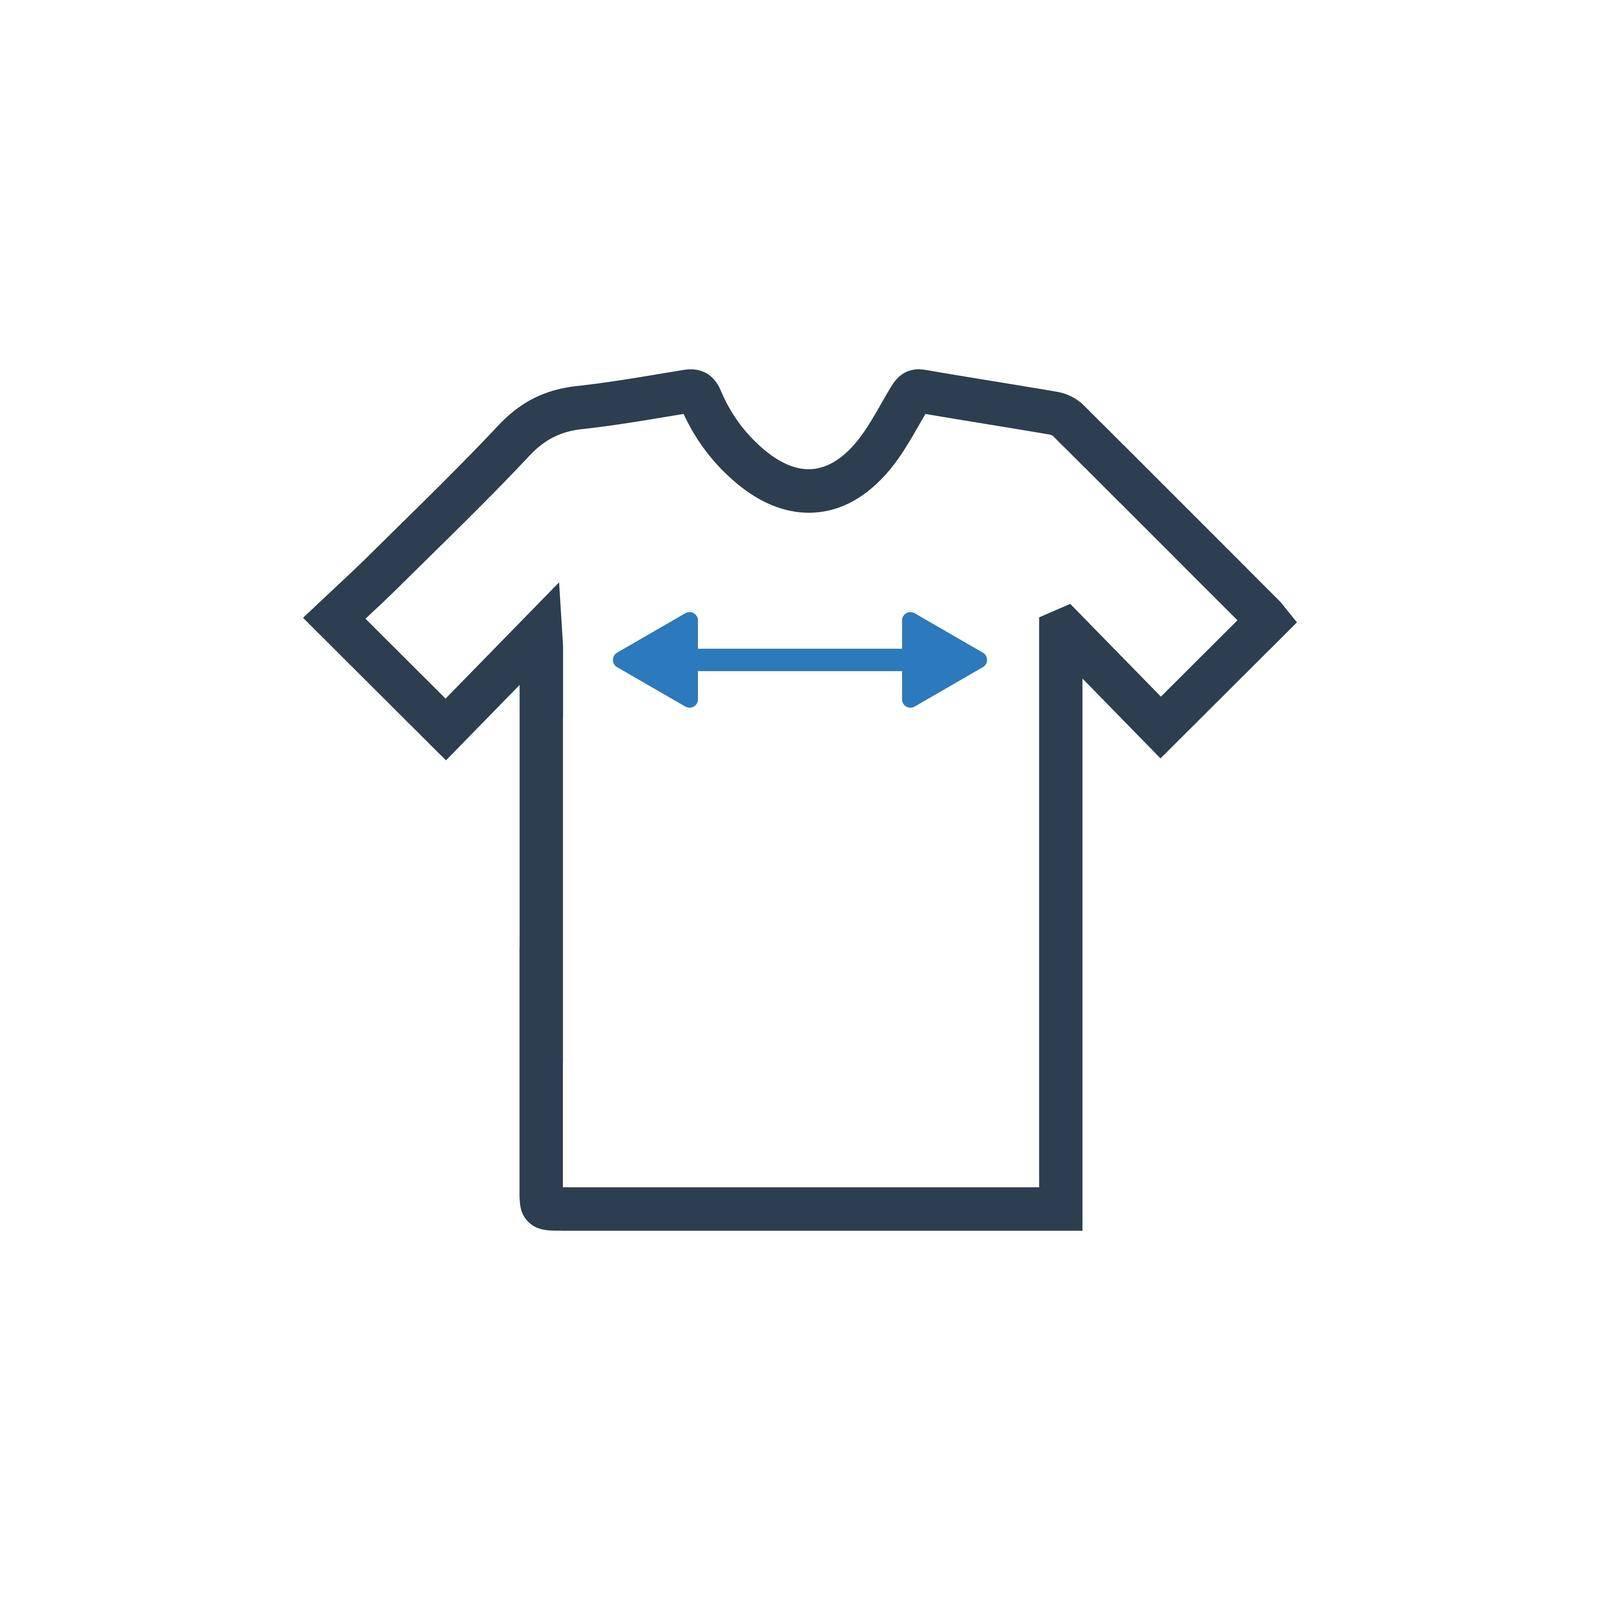 Shirt Sizing icon. Vector EPS file.